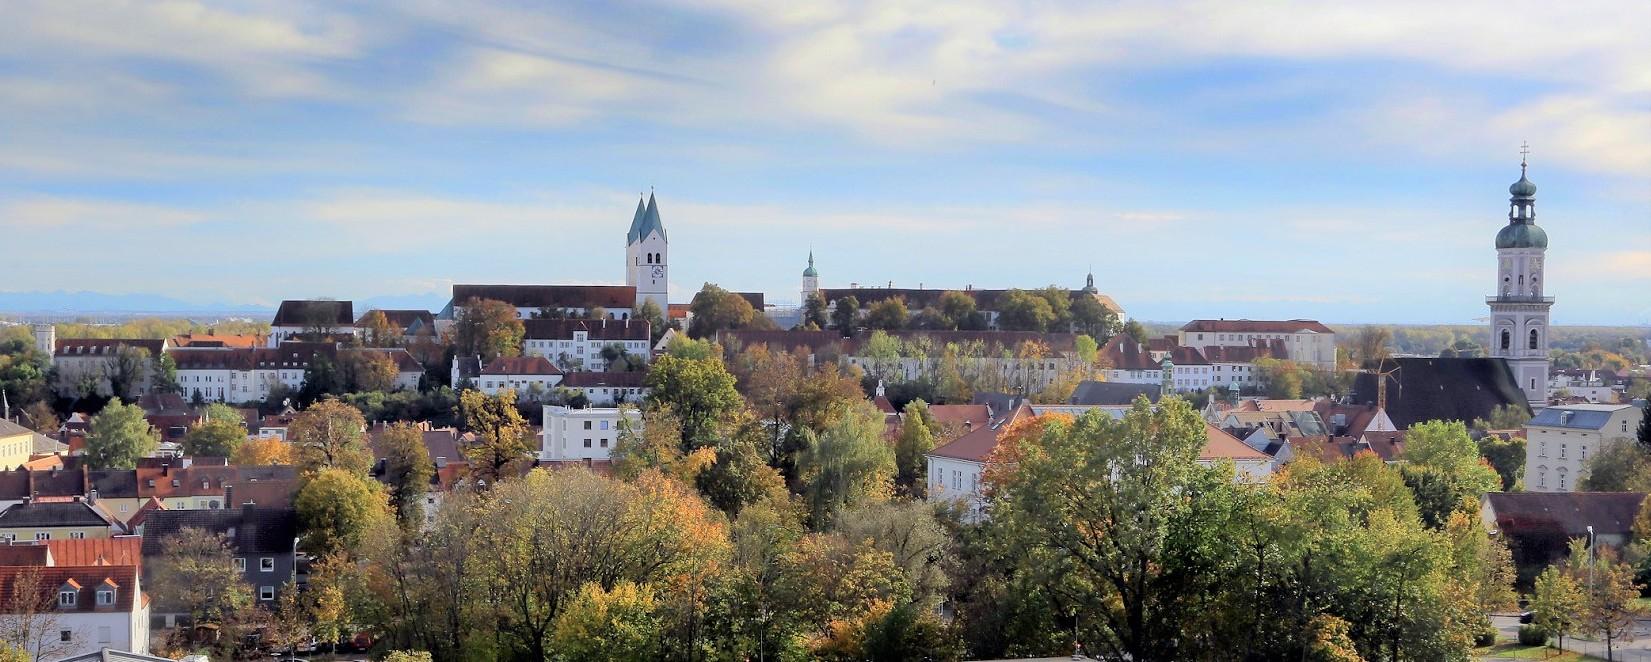 Panoramablick im Herbst auf Freising